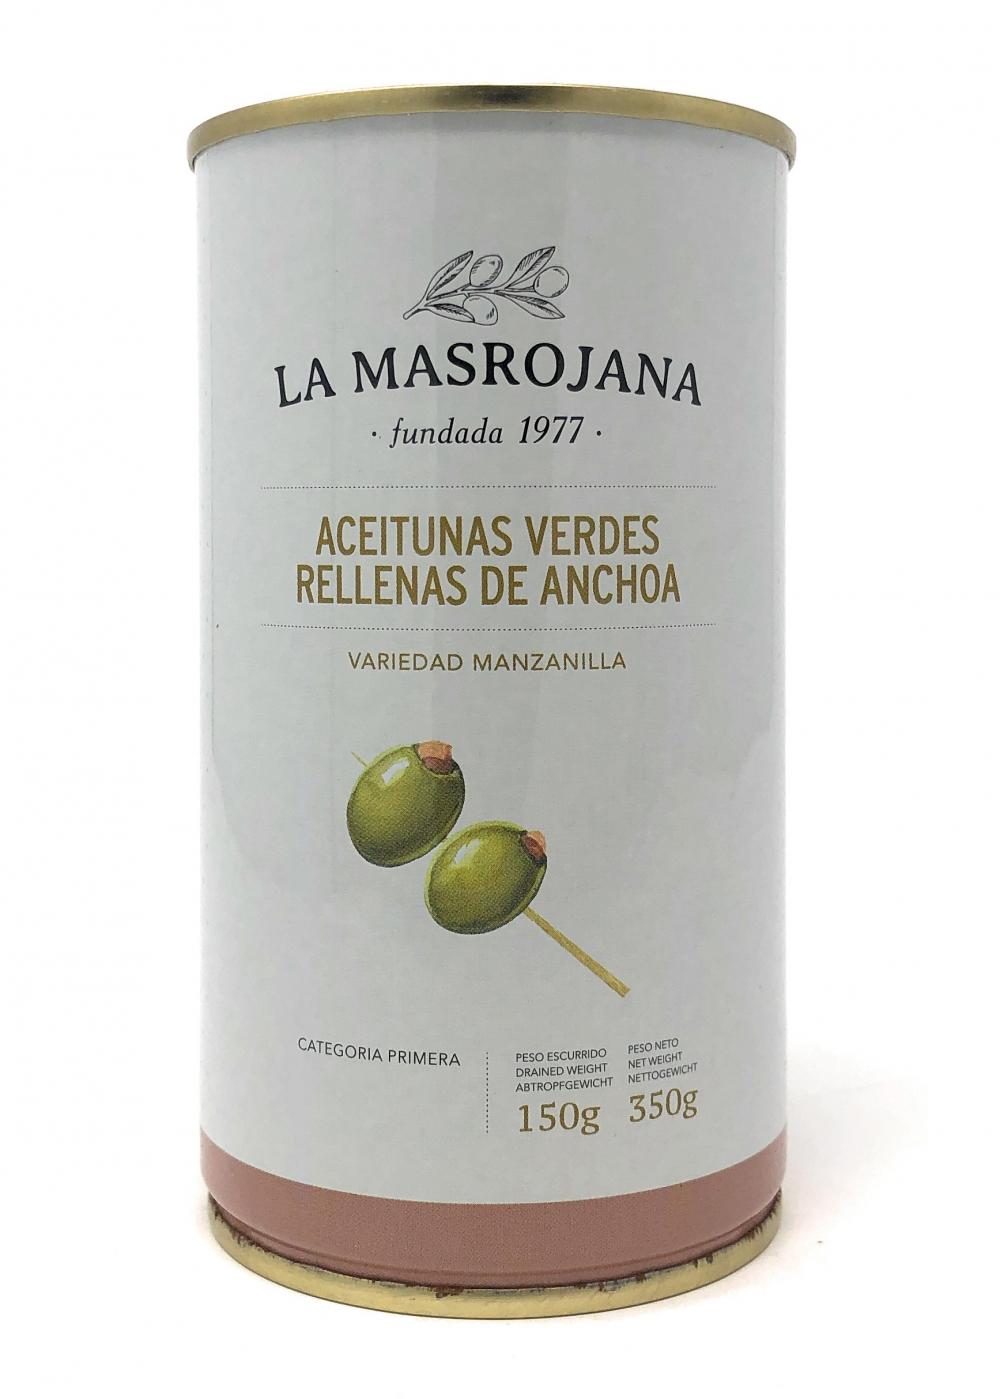 La Masrojana Grüne Manzanilla-Oliven gefüllt mit Anchovis 150g Dose